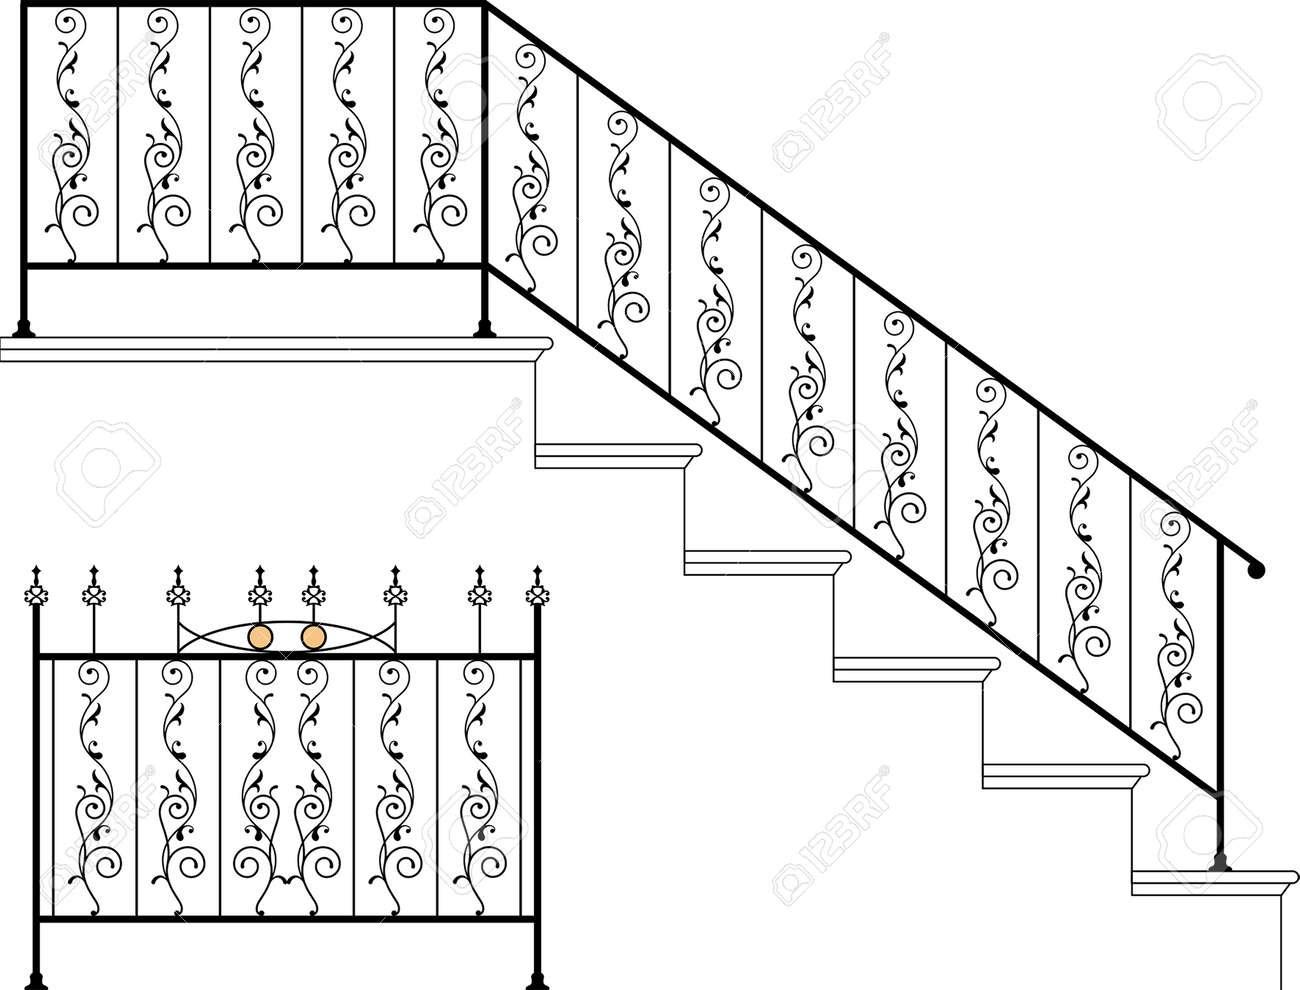 Wrought Iron Stair Railing Design Vector Art Royalty Free Cliparts   Wrought Iron Stair Railing   Italian   Front Porch   French   Mediterranean   Design